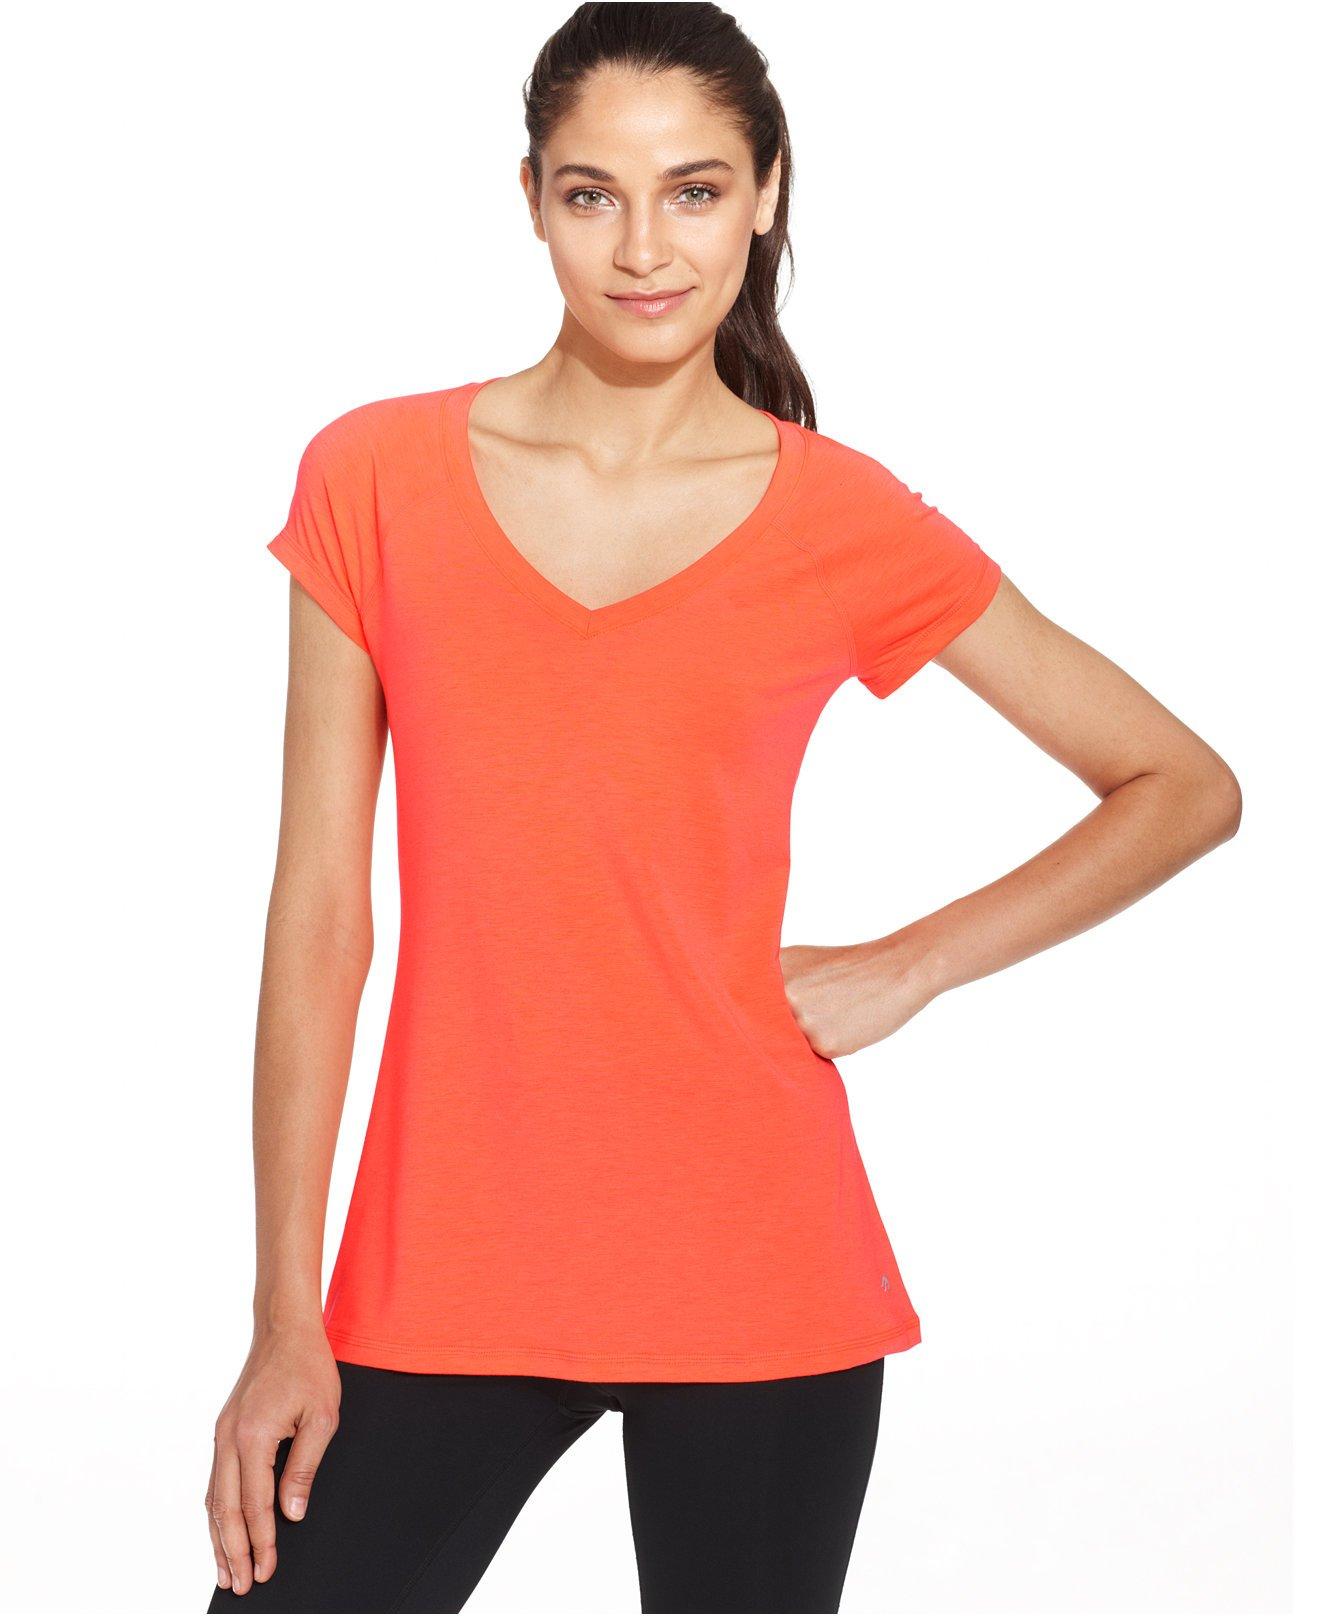 Ideology women 39 s low cut v neck tee shirt punch medium ebay for Low neck t shirts women s